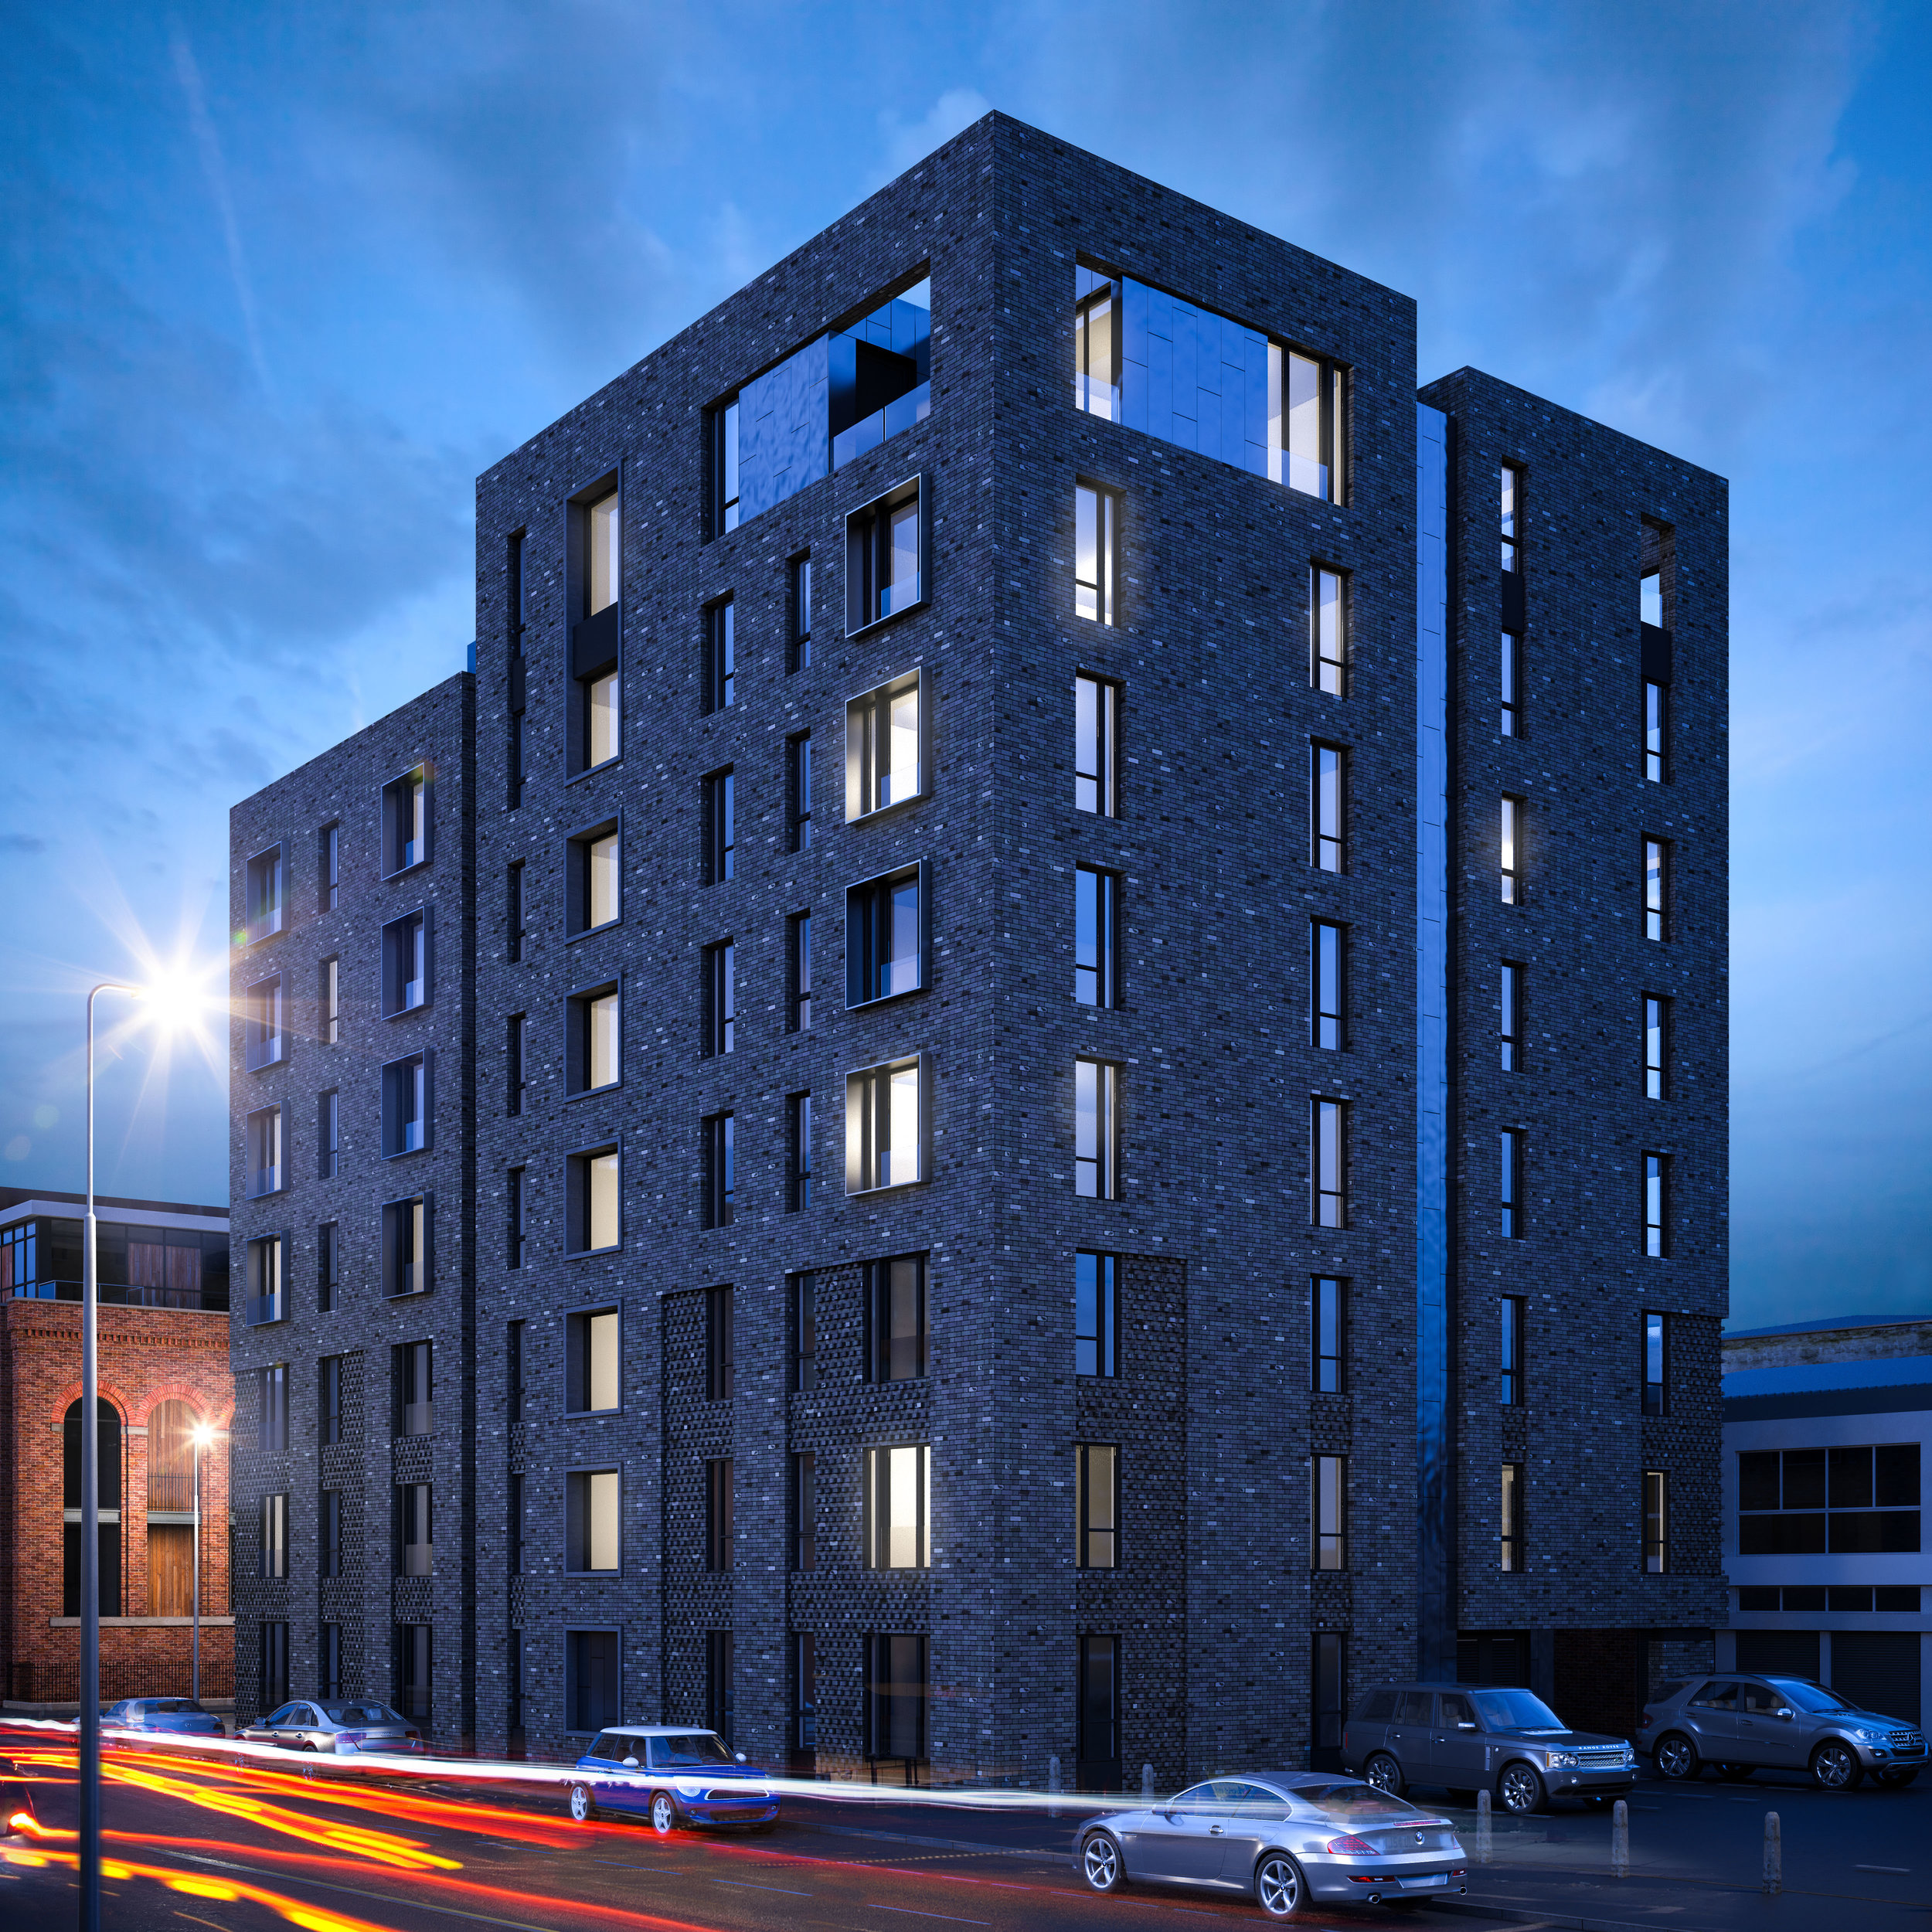 H2 Apartments